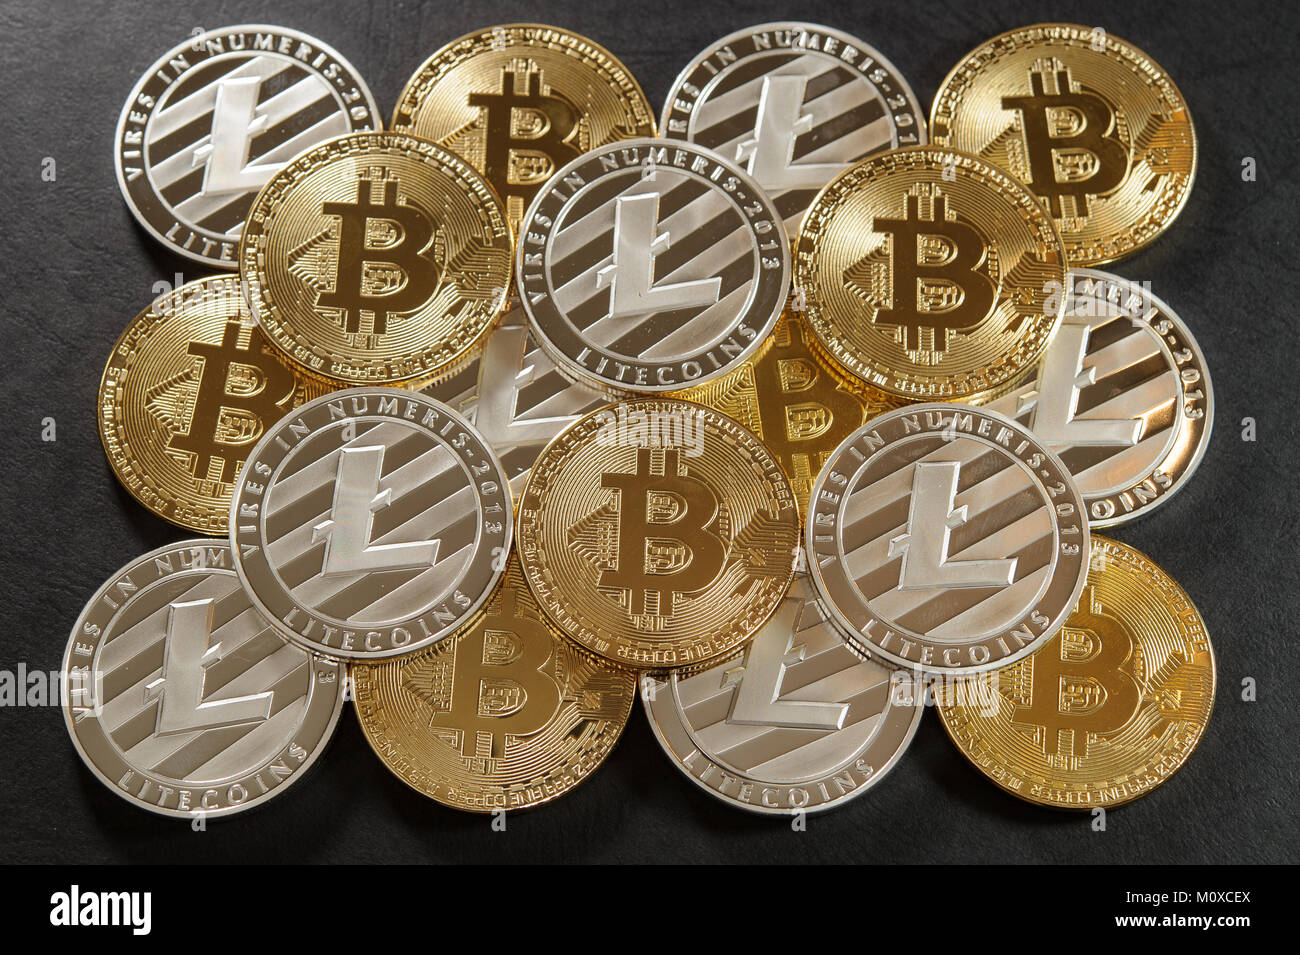 Litecoins or bitcoins redskins betting